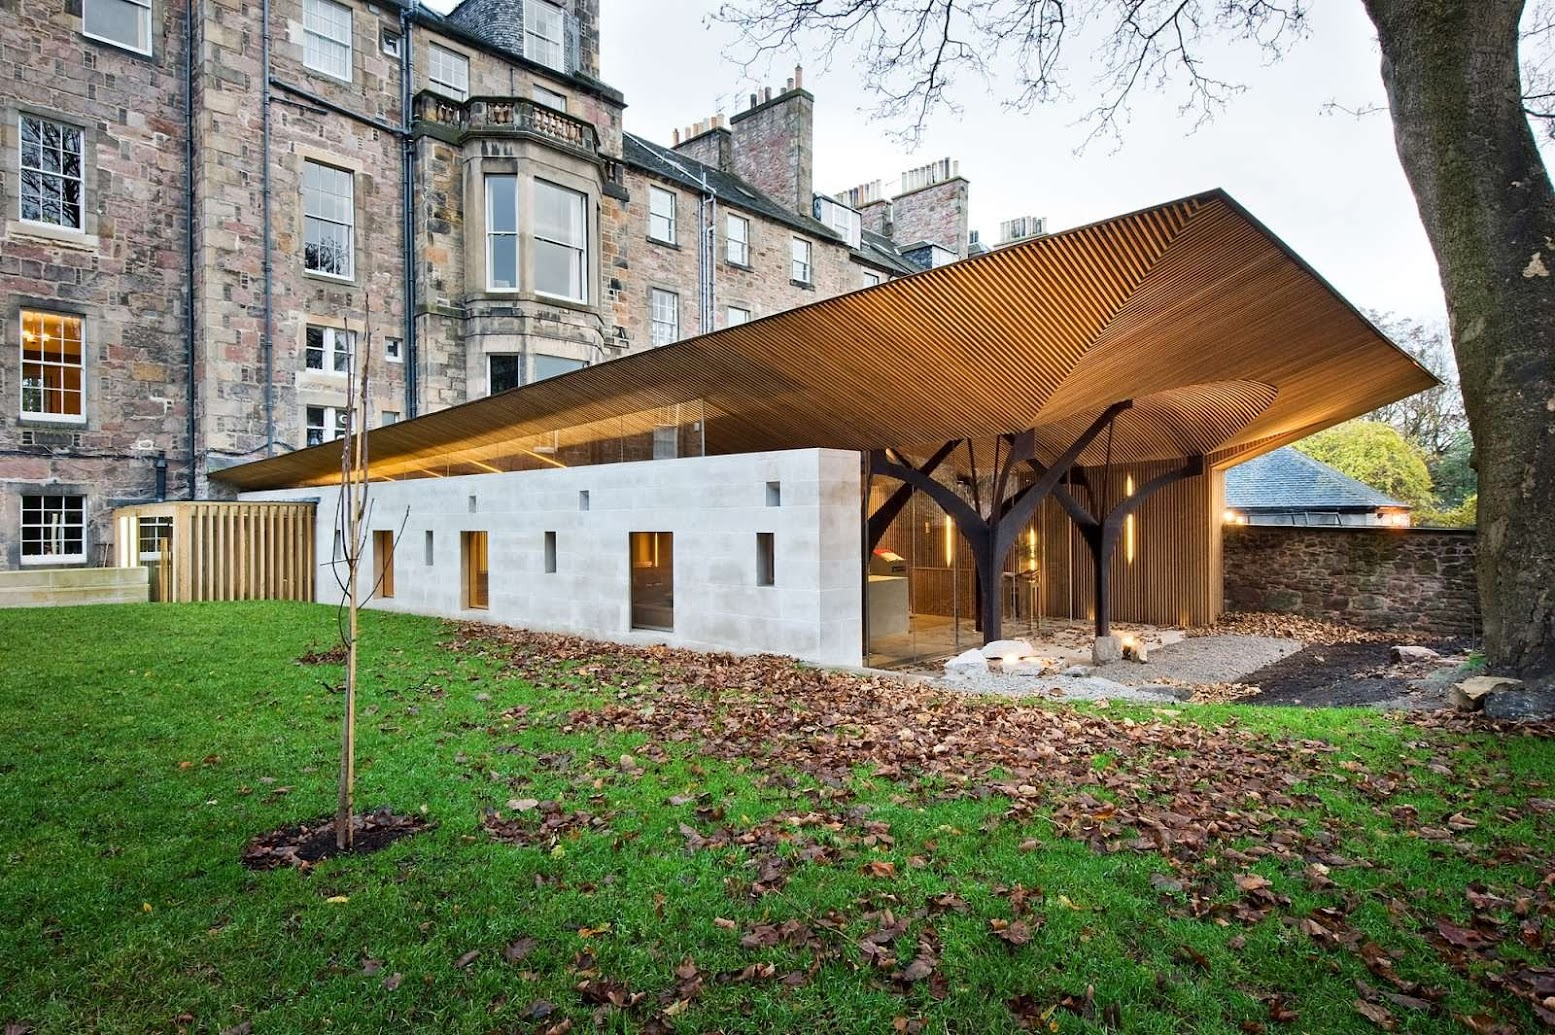 Unusual Architecture: England